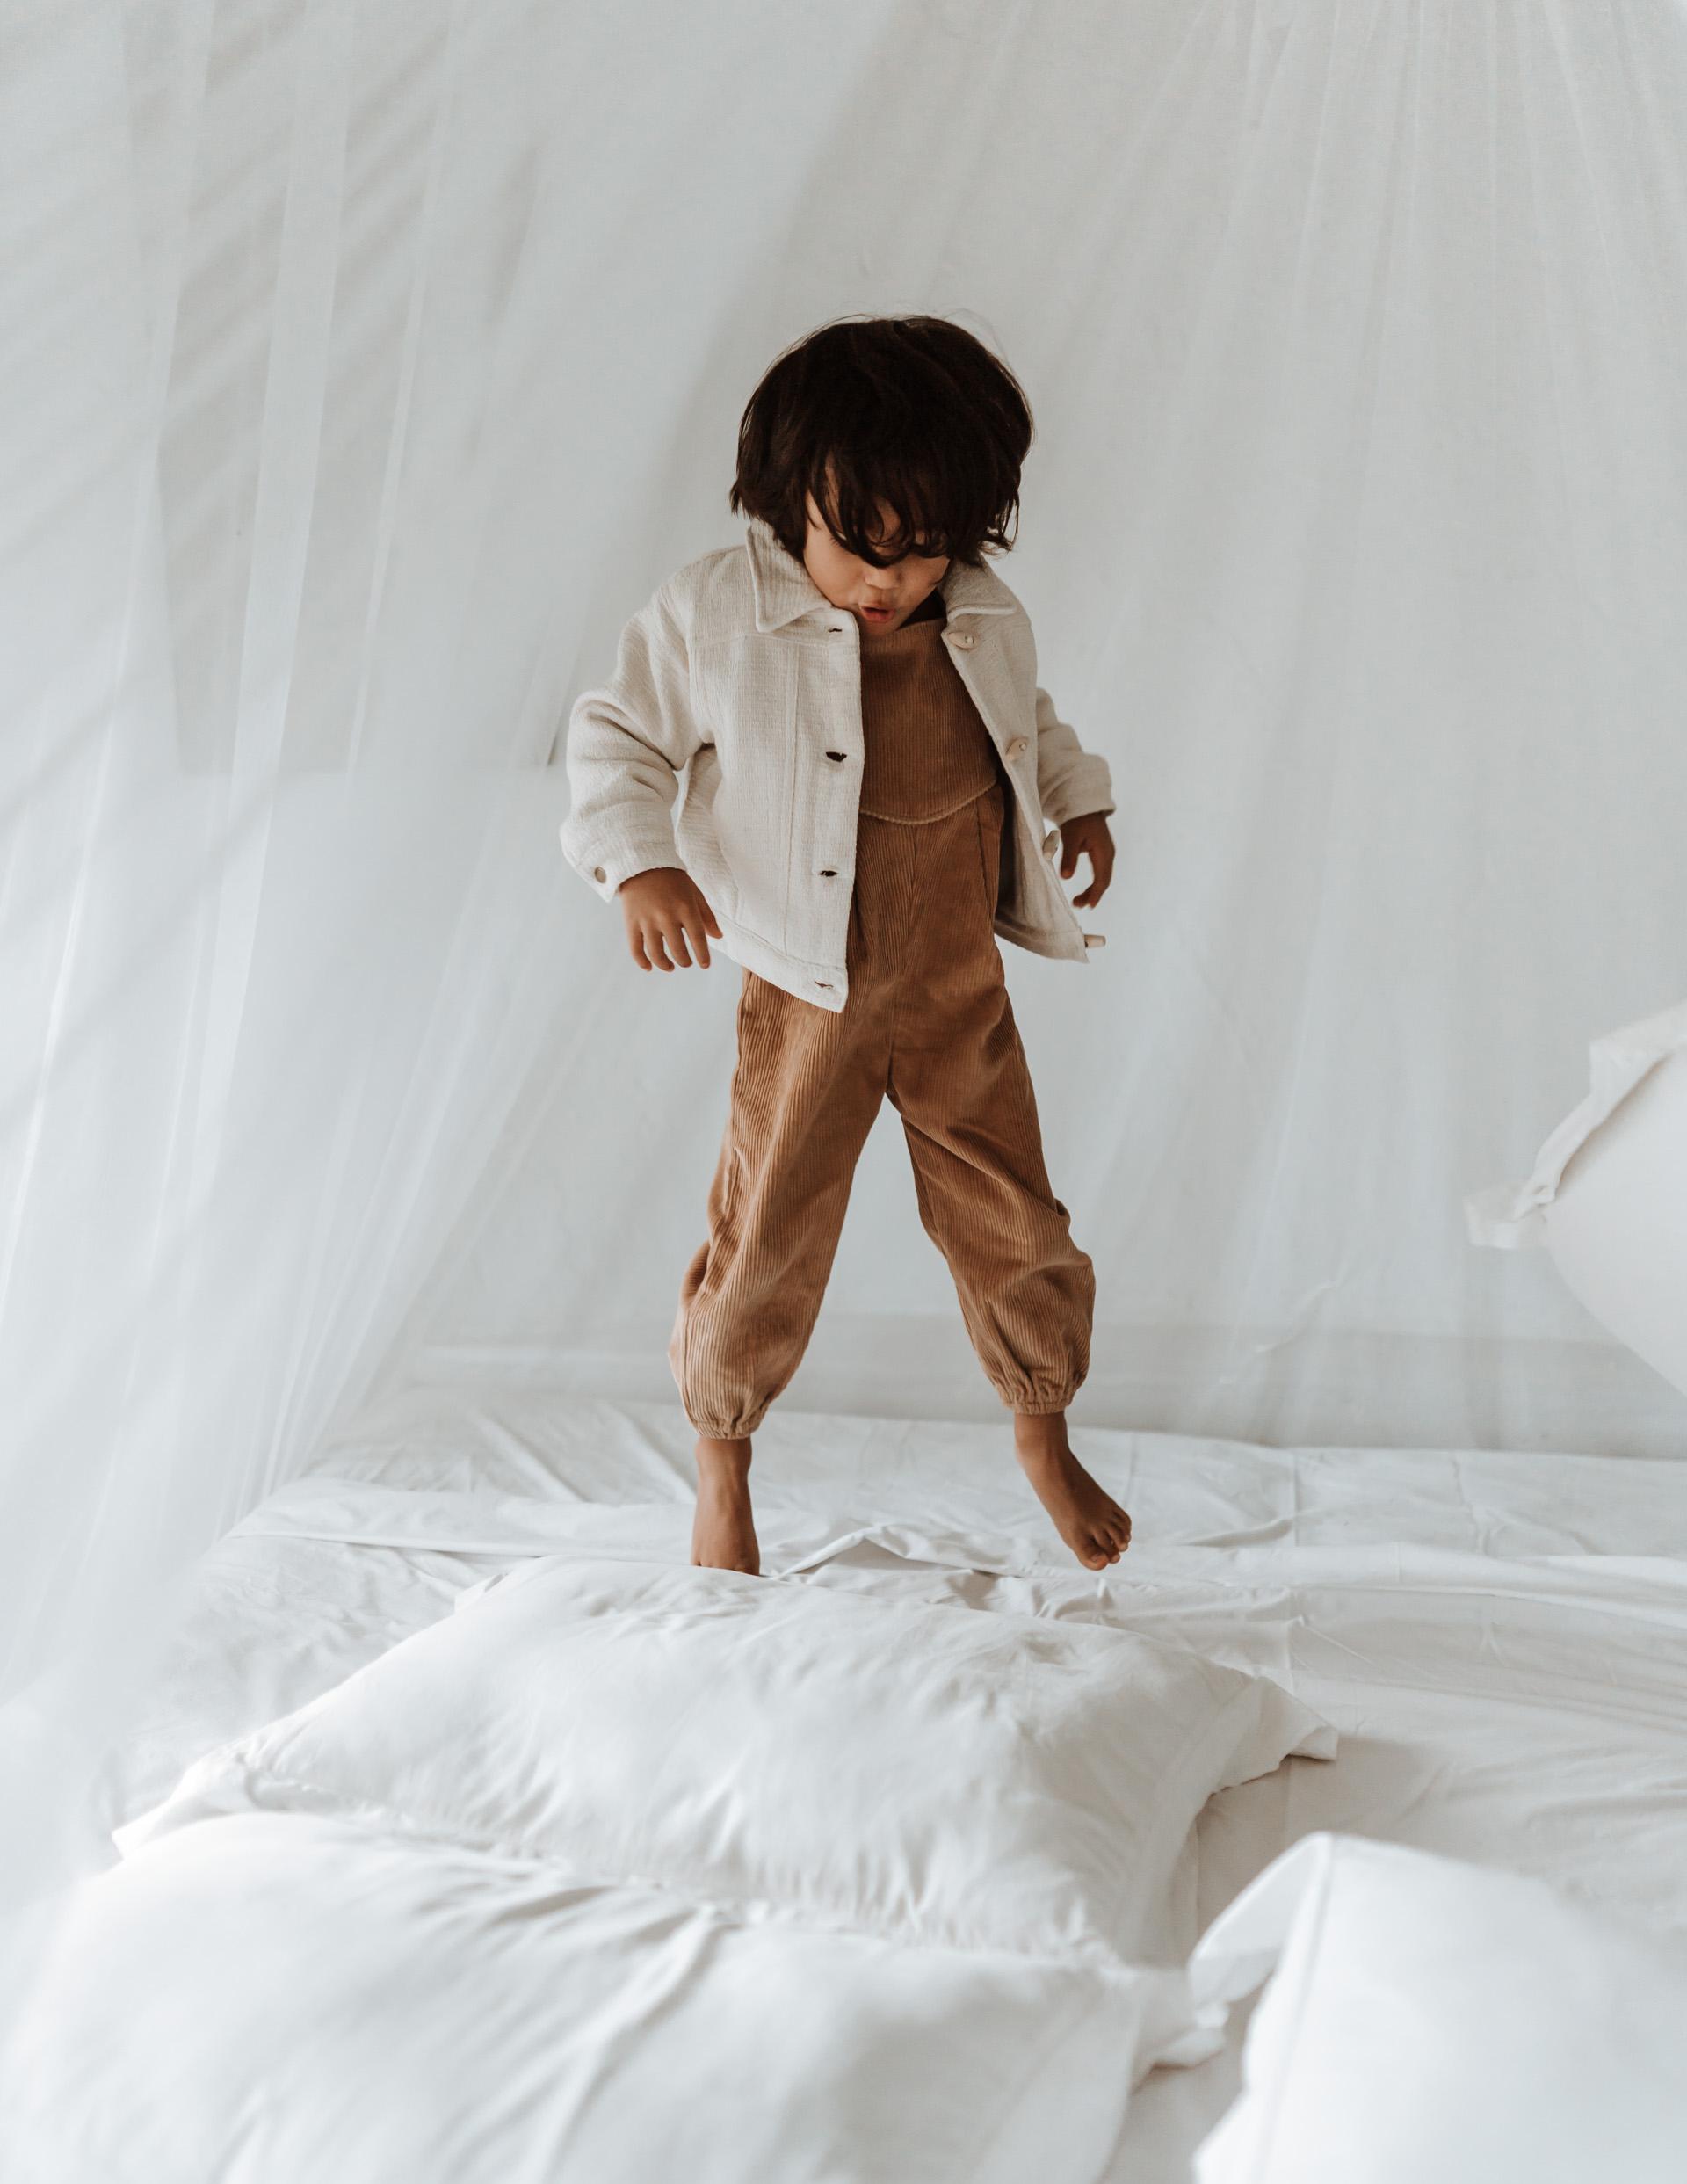 keira-mason-illoura-the-label-boy-jumping-high.jpg